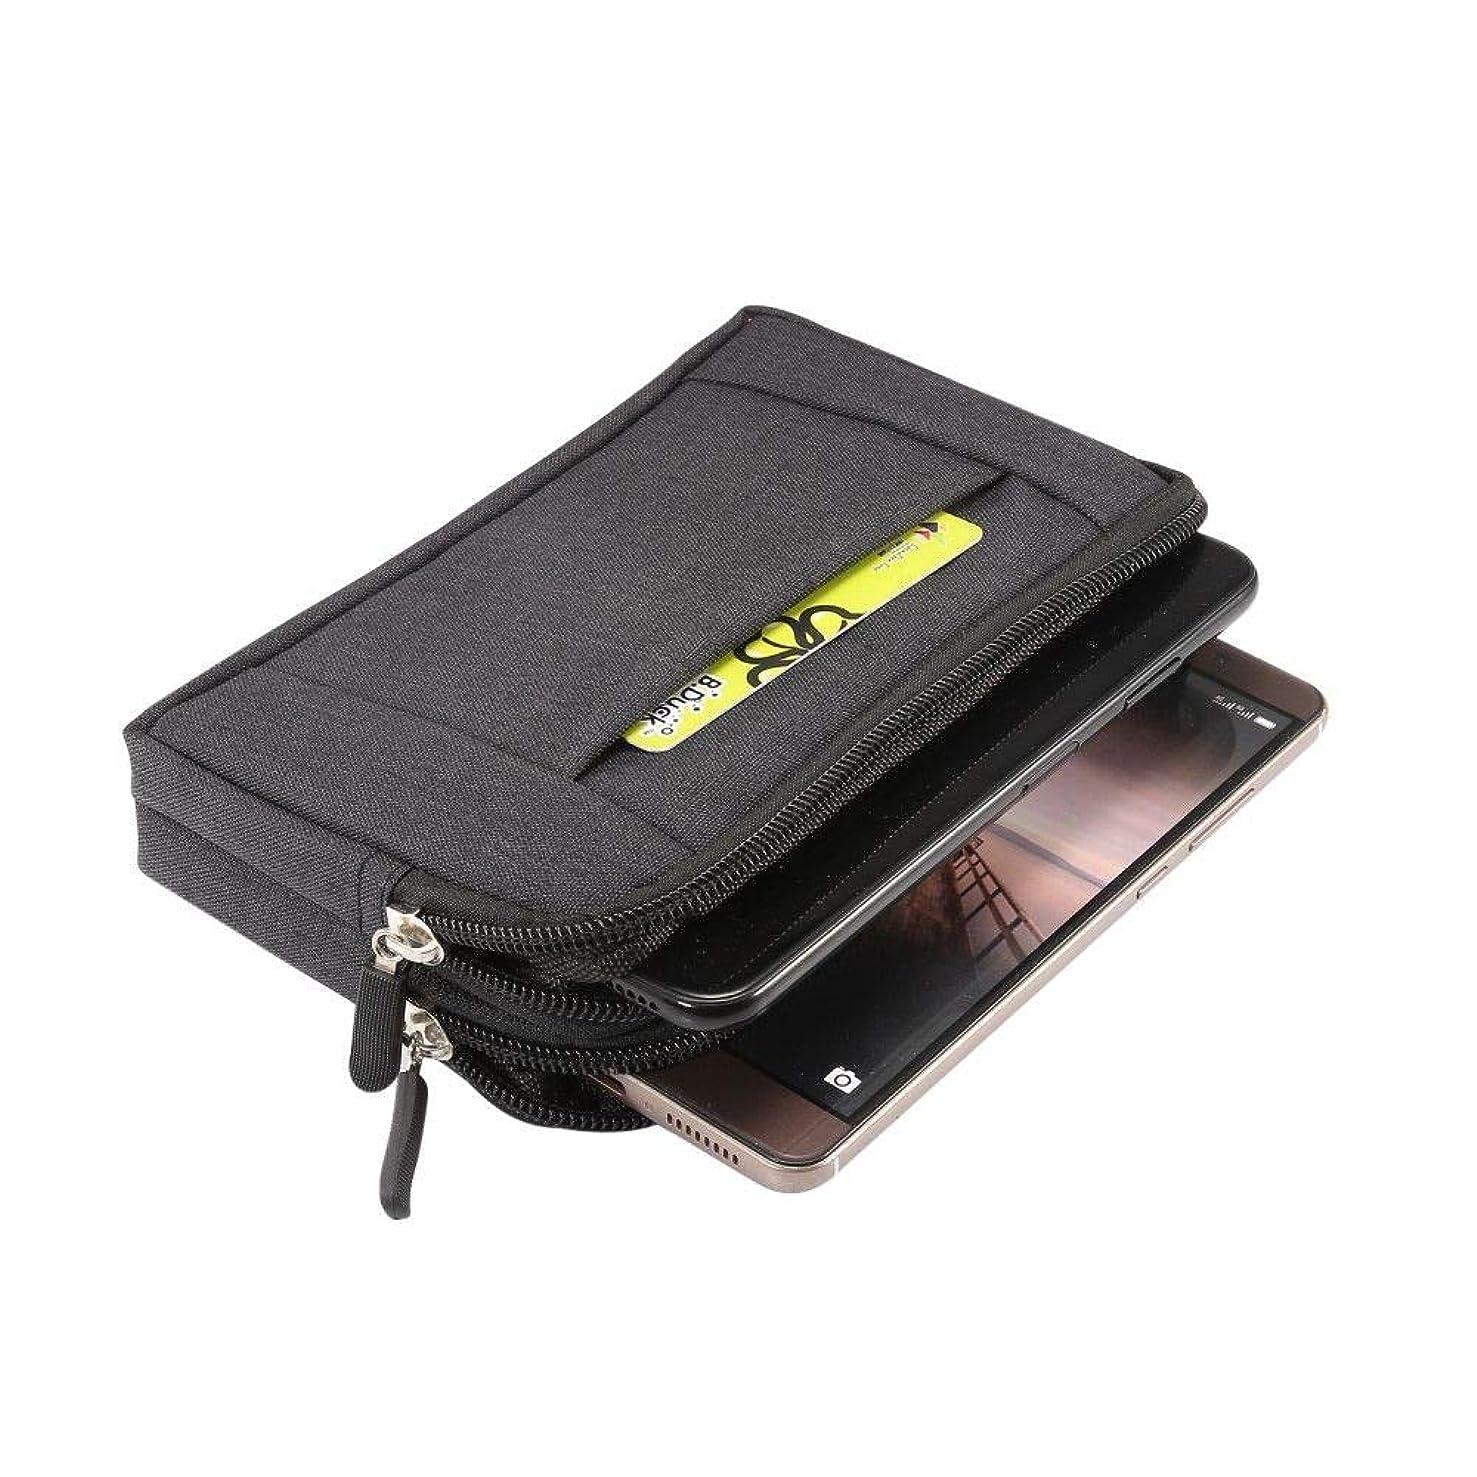 DFV mobile - Multipurpose Horizontal Belt Case 2 Compartments Zipper for => Samsung SGH-N417 Galaxy Feel 4G > Black (16,5 x 9 x 2 cm)